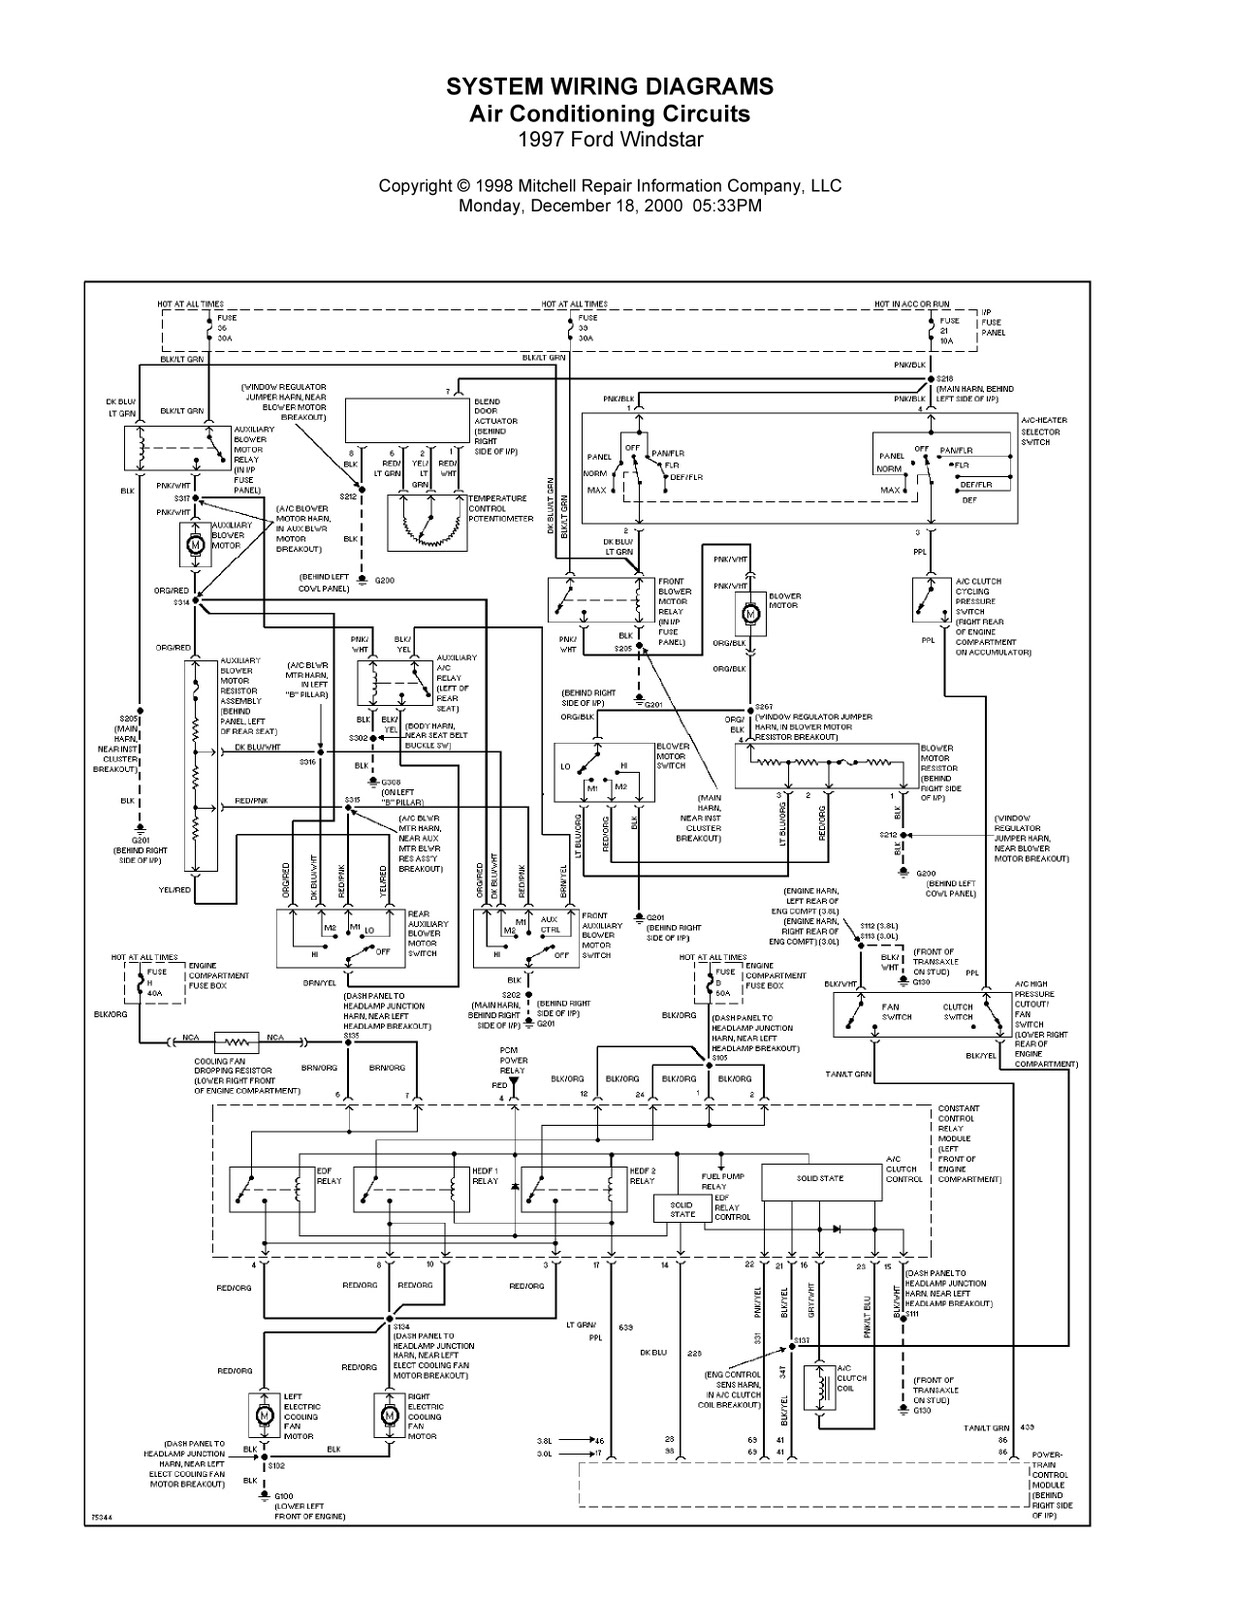 Mitsubishi 380 Stereo Wiring Diagram Automotive Diagrams Manual Kulkas 2 Pintu